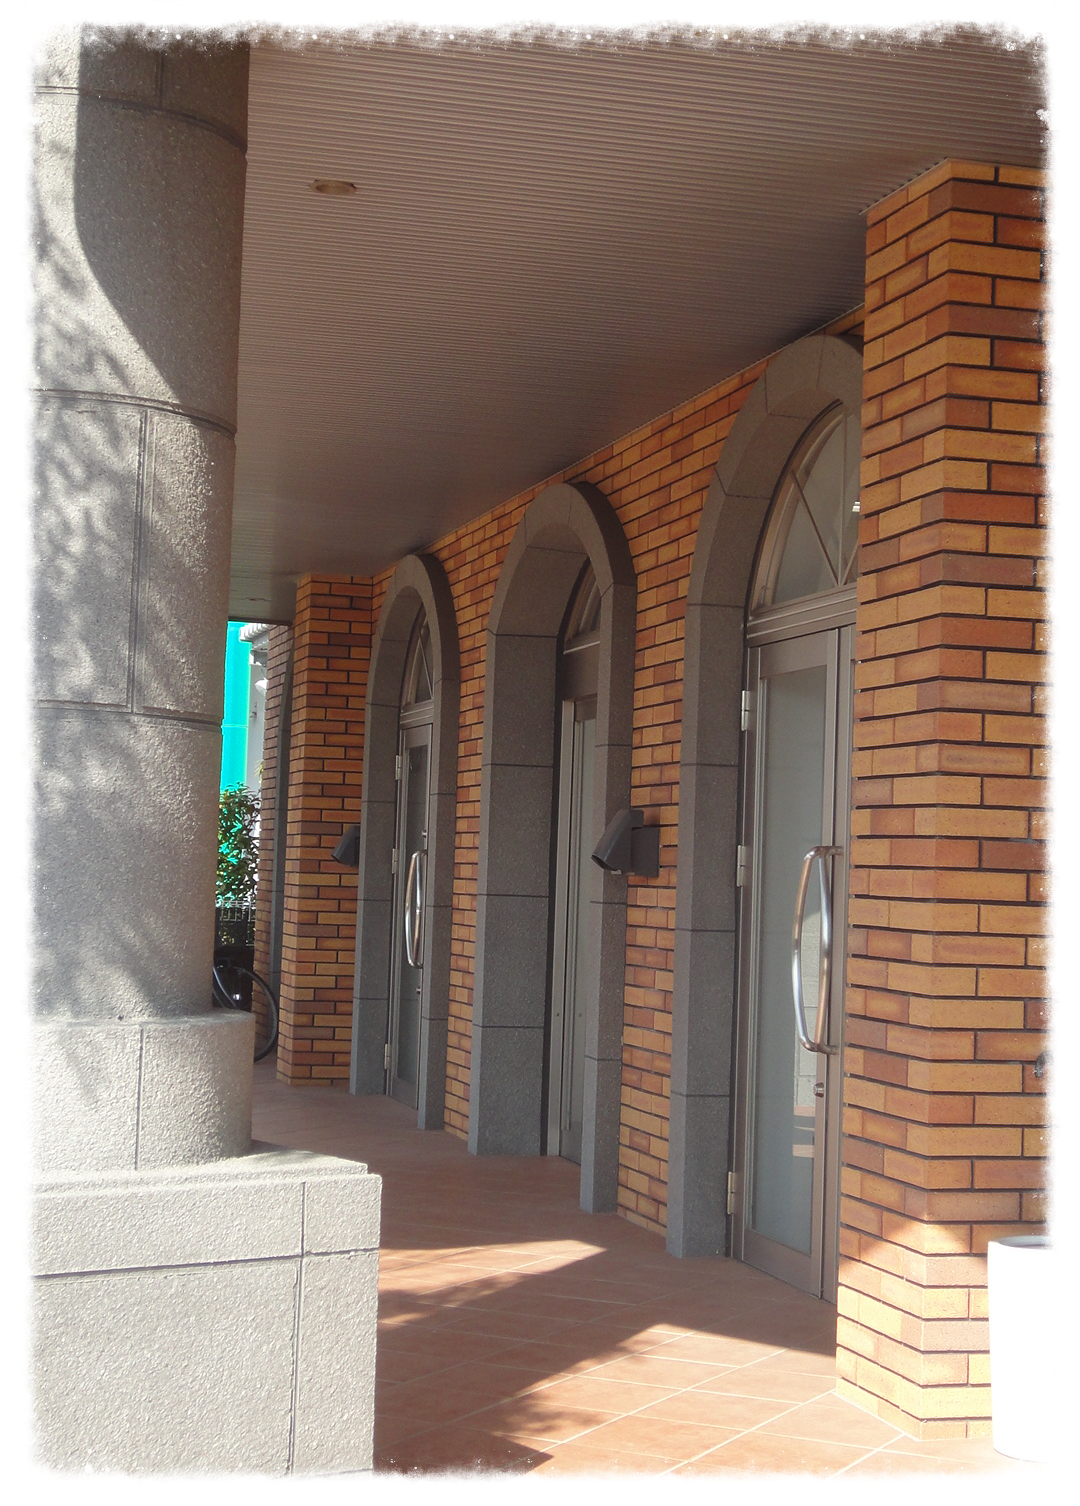 1F左側の2枚のドアがCLOVERです